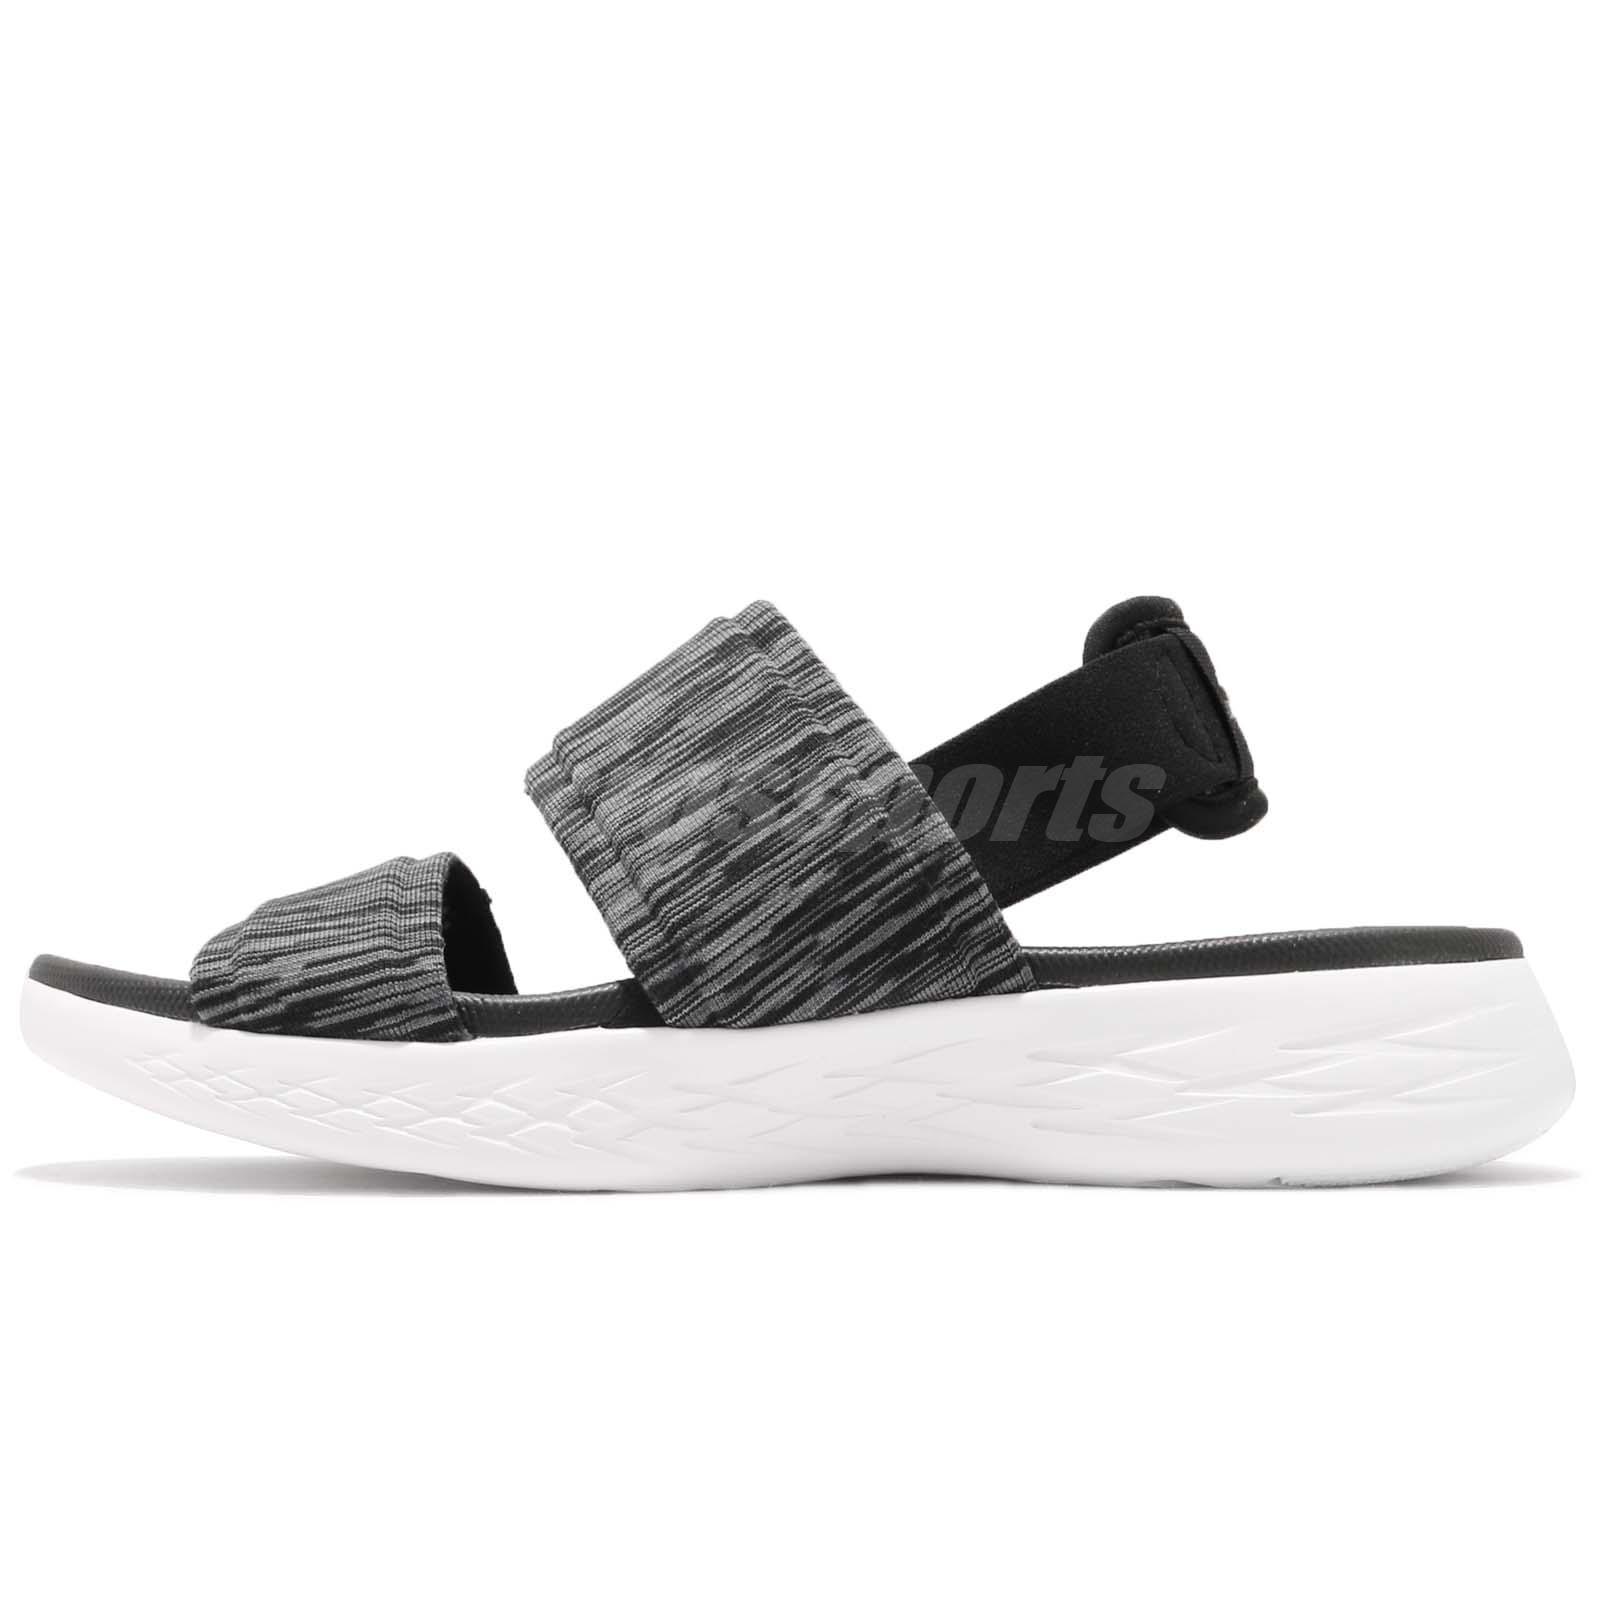 b4763ab811ea Skechers On-The-Go 600-Foxy Black White Women Sports Sandal Shoes 15309-BKW